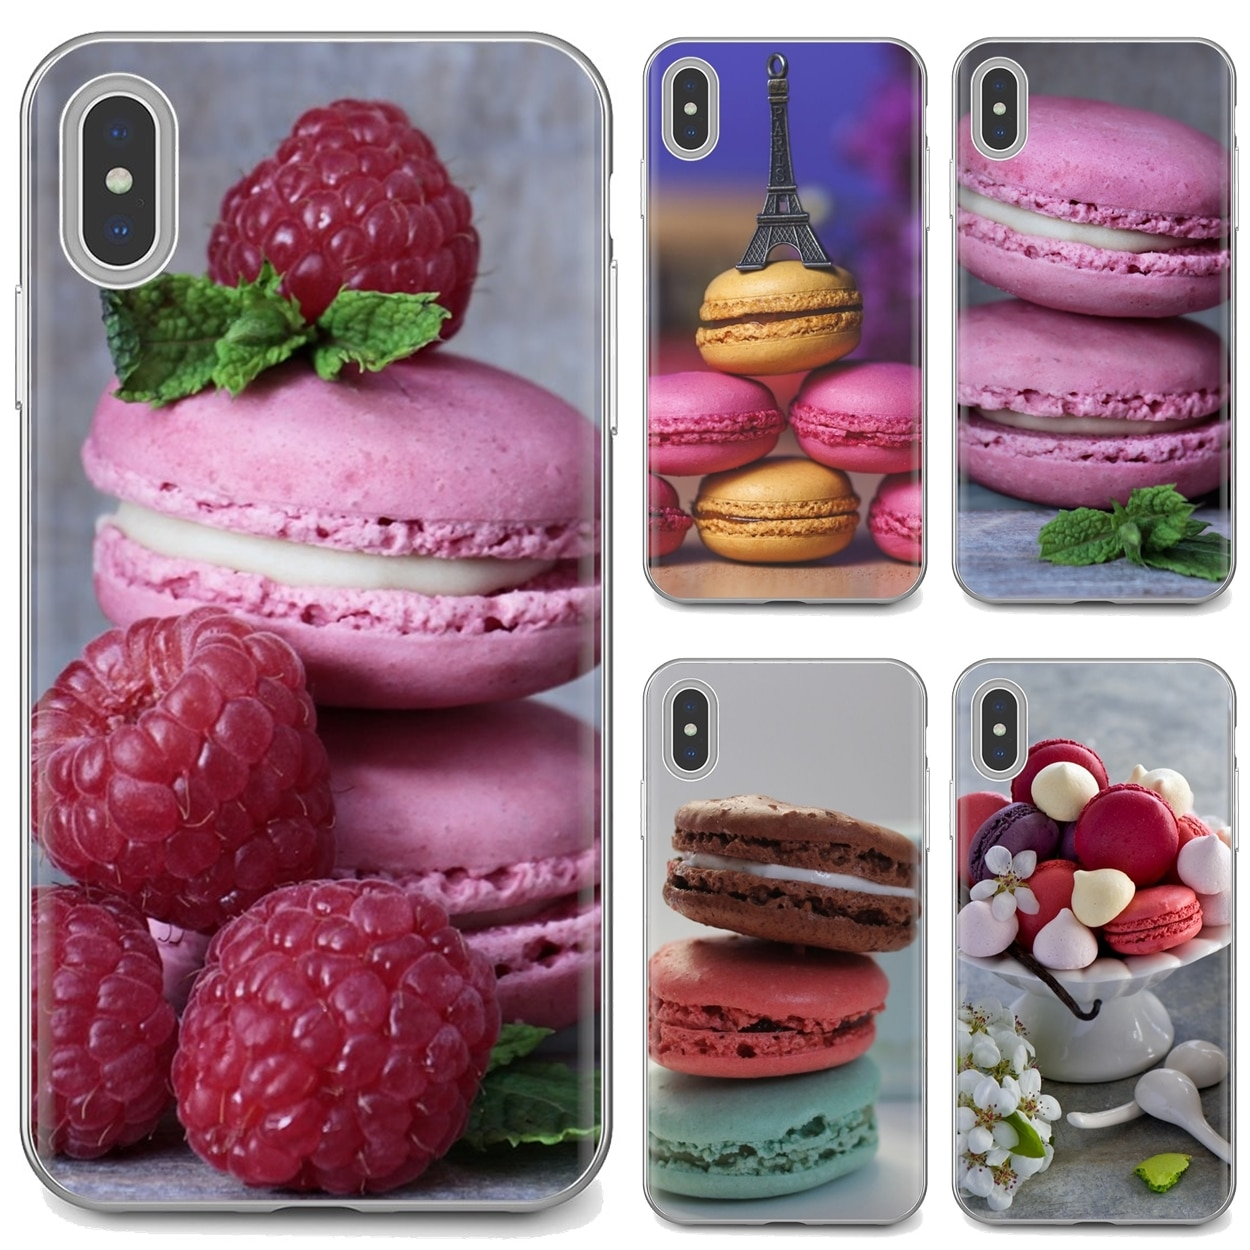 For Samsung Galaxy J1 J2 J3 J4 J5 J6 J7 J8 Plus 2018 Prime 2015 2016 2017 Colorful Silicone Phone Case Food Wallpaper Macaron